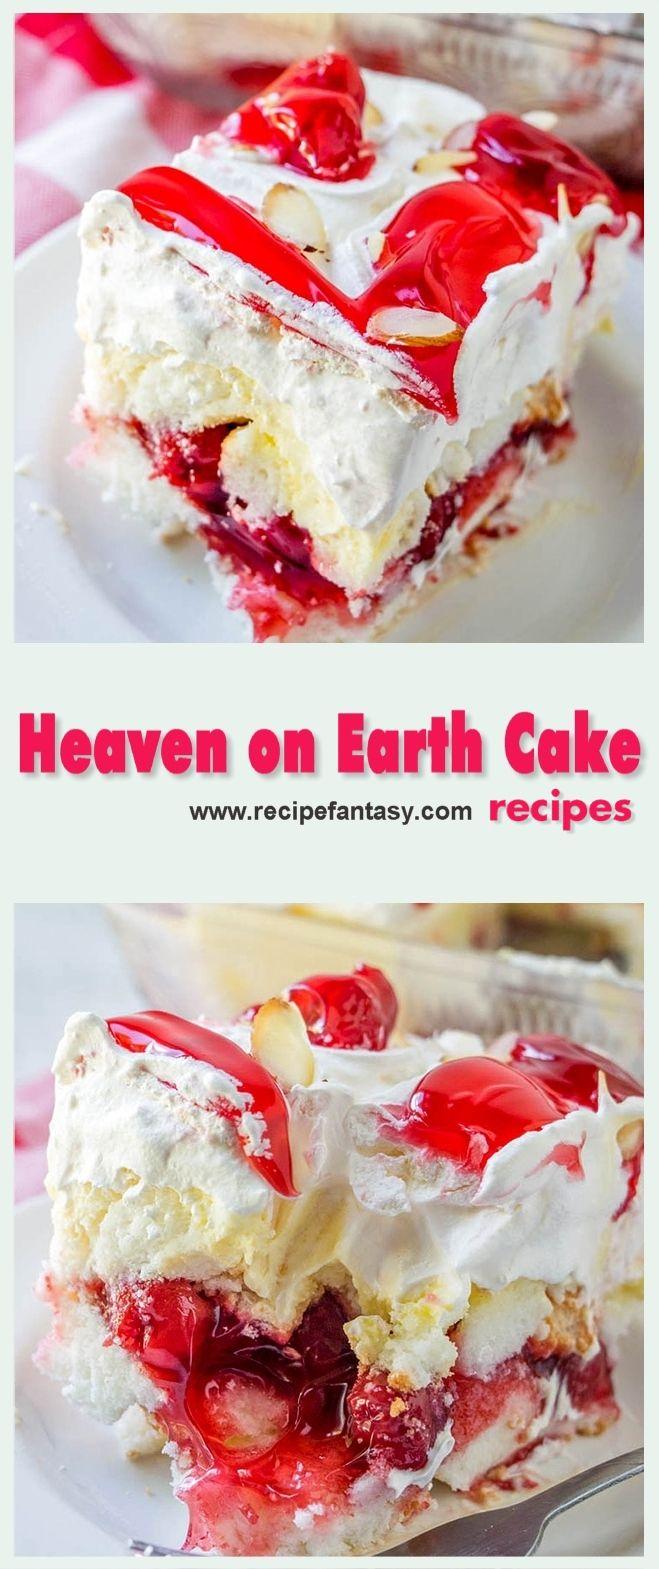 Heaven on Earth Cake Recipes 2019 -   10 desserts Fun cake mixes ideas